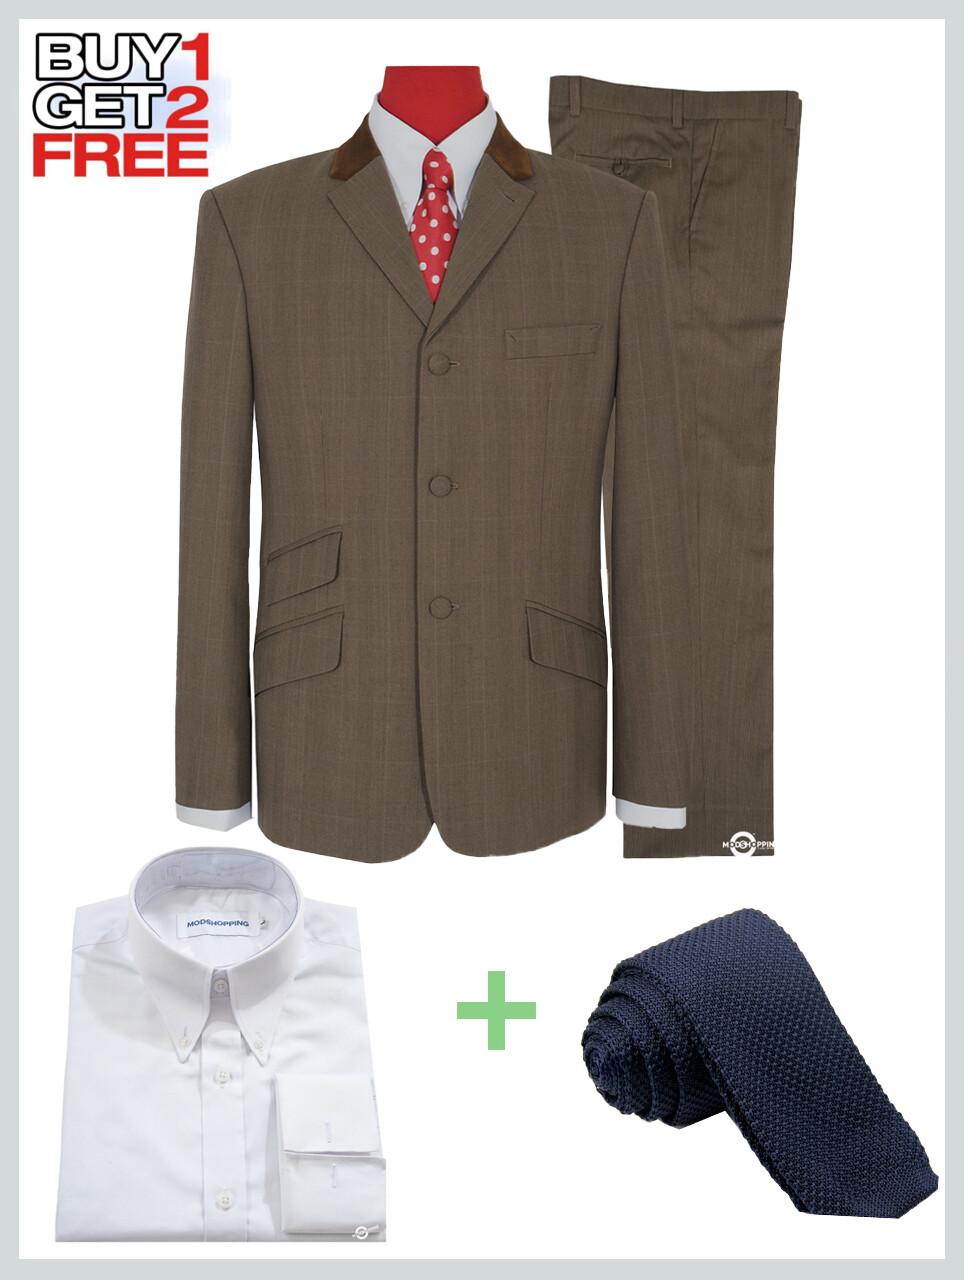 2 Piece Suit Package | Brown & Grey Contrast Pow Check Suit For Men.